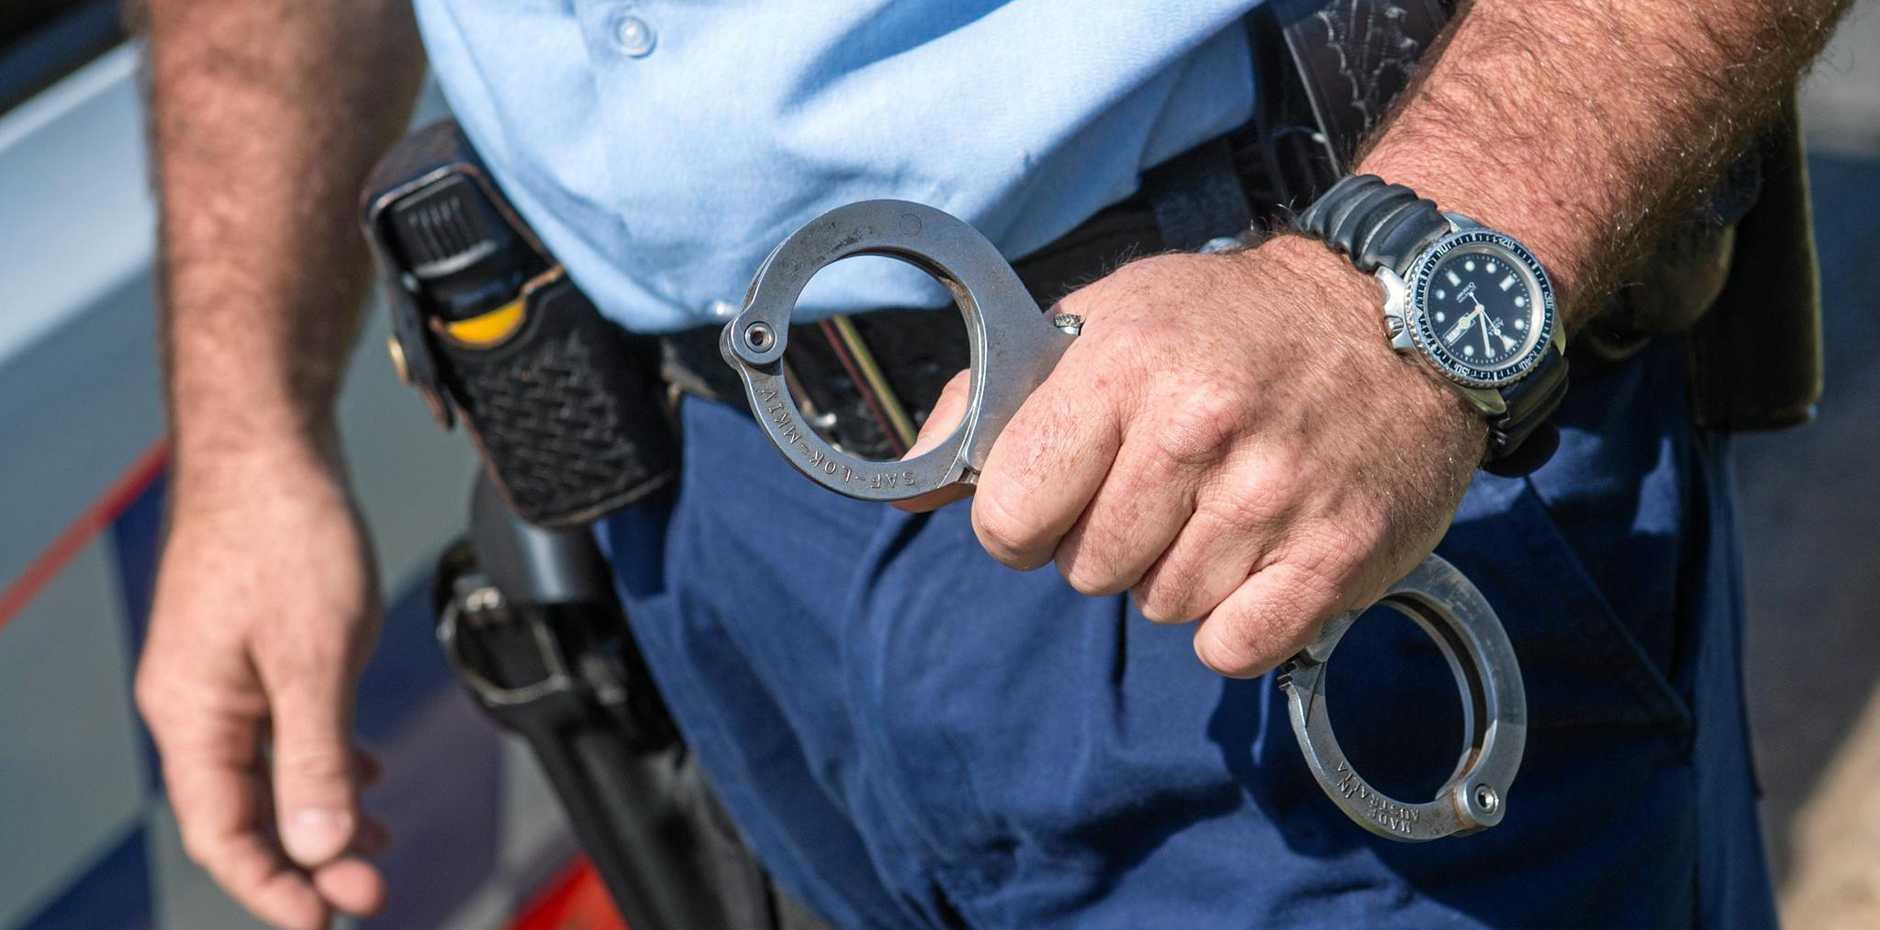 NSW police generic Handcuffs arrest. 07 October 2016